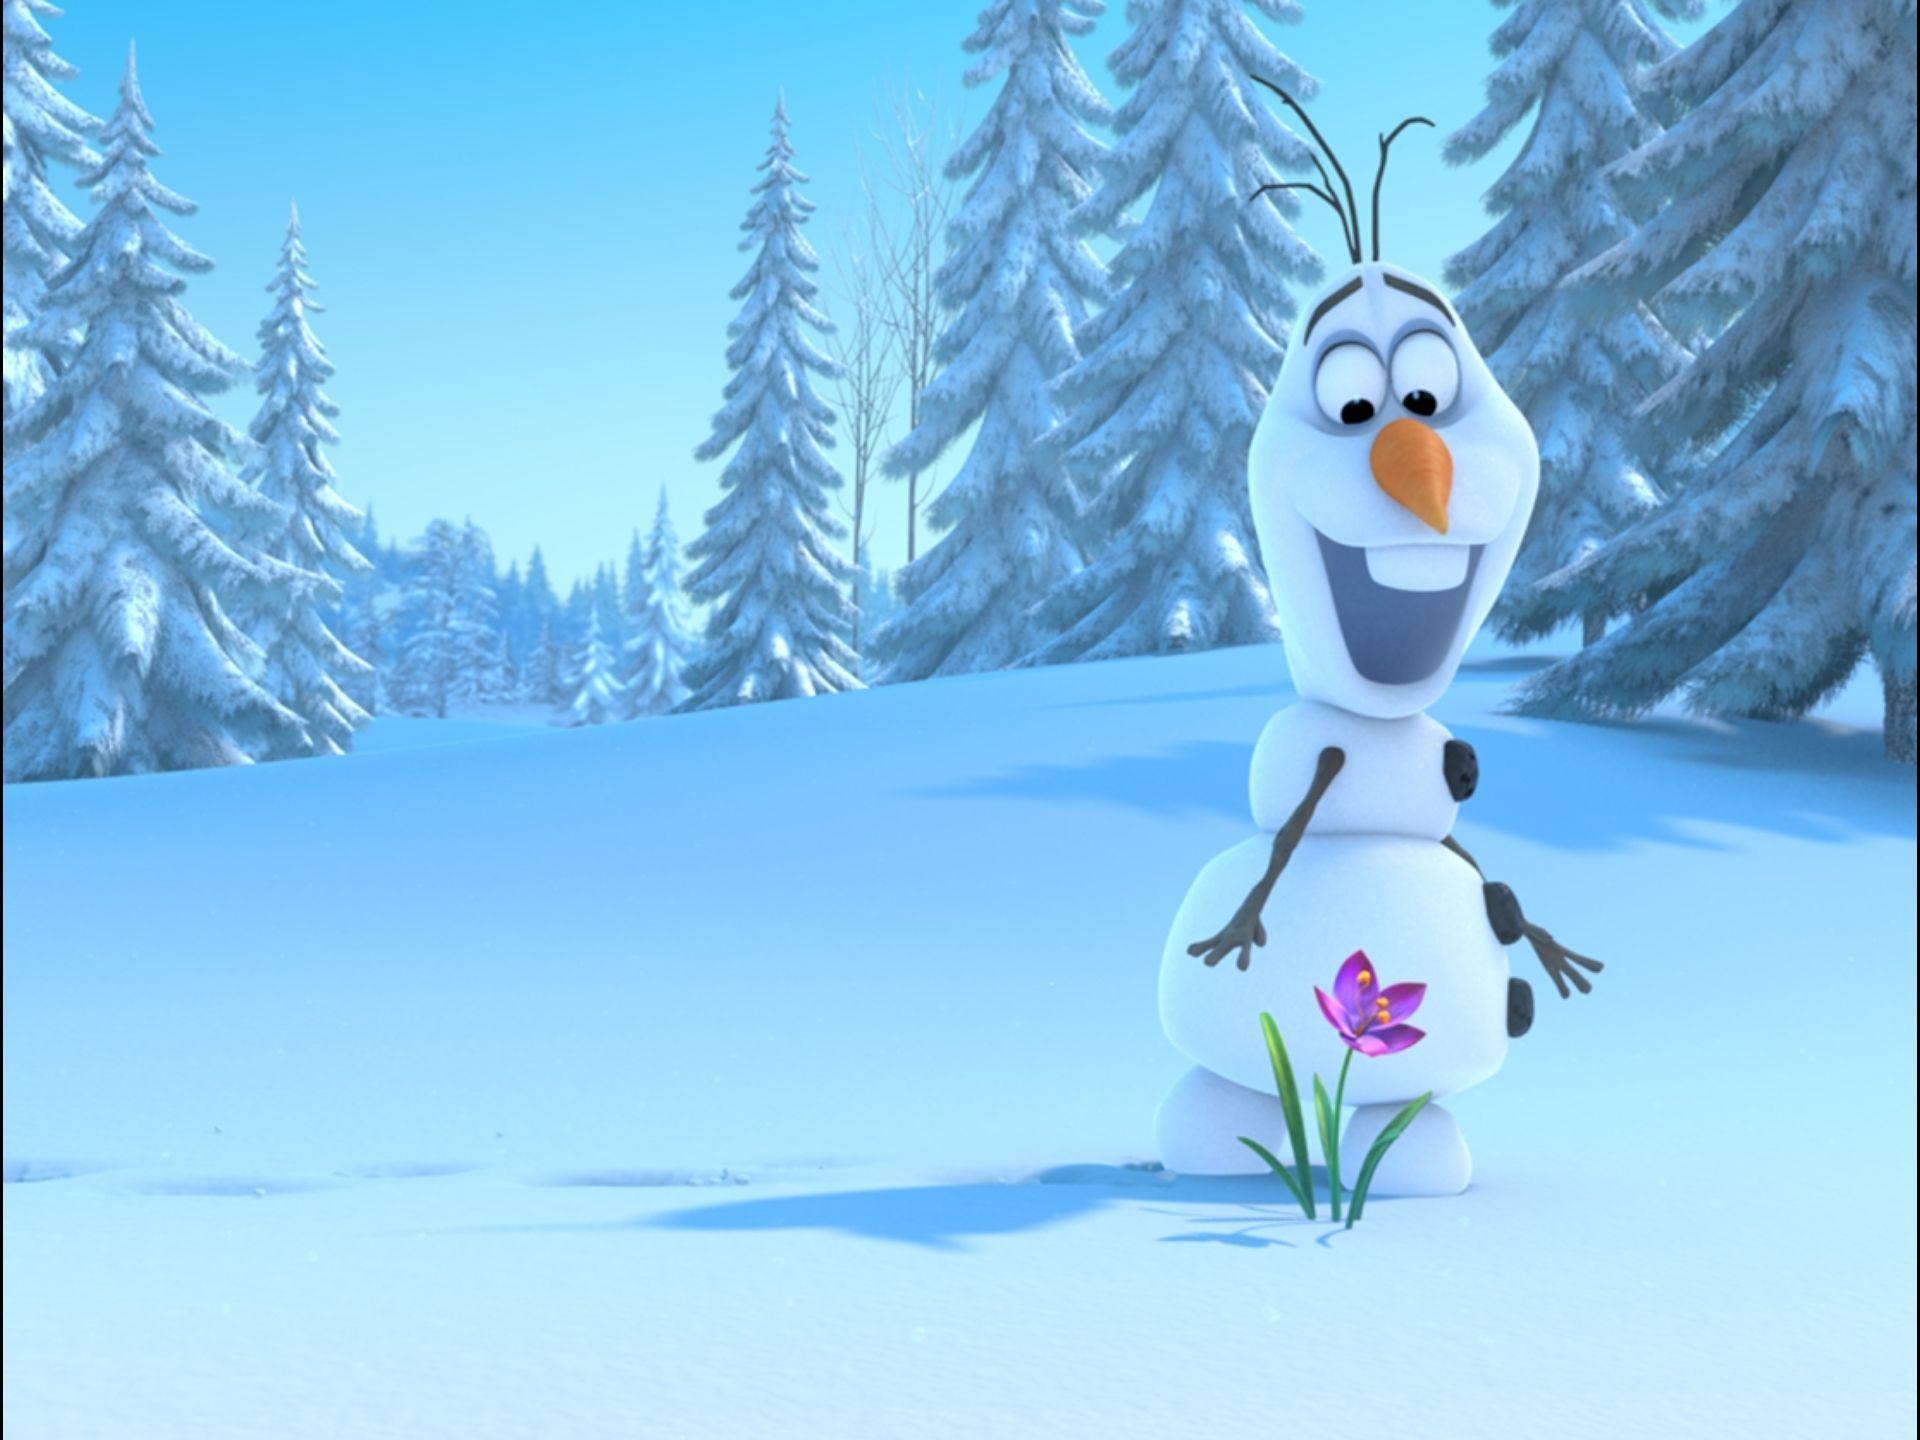 Disney frozen movie any